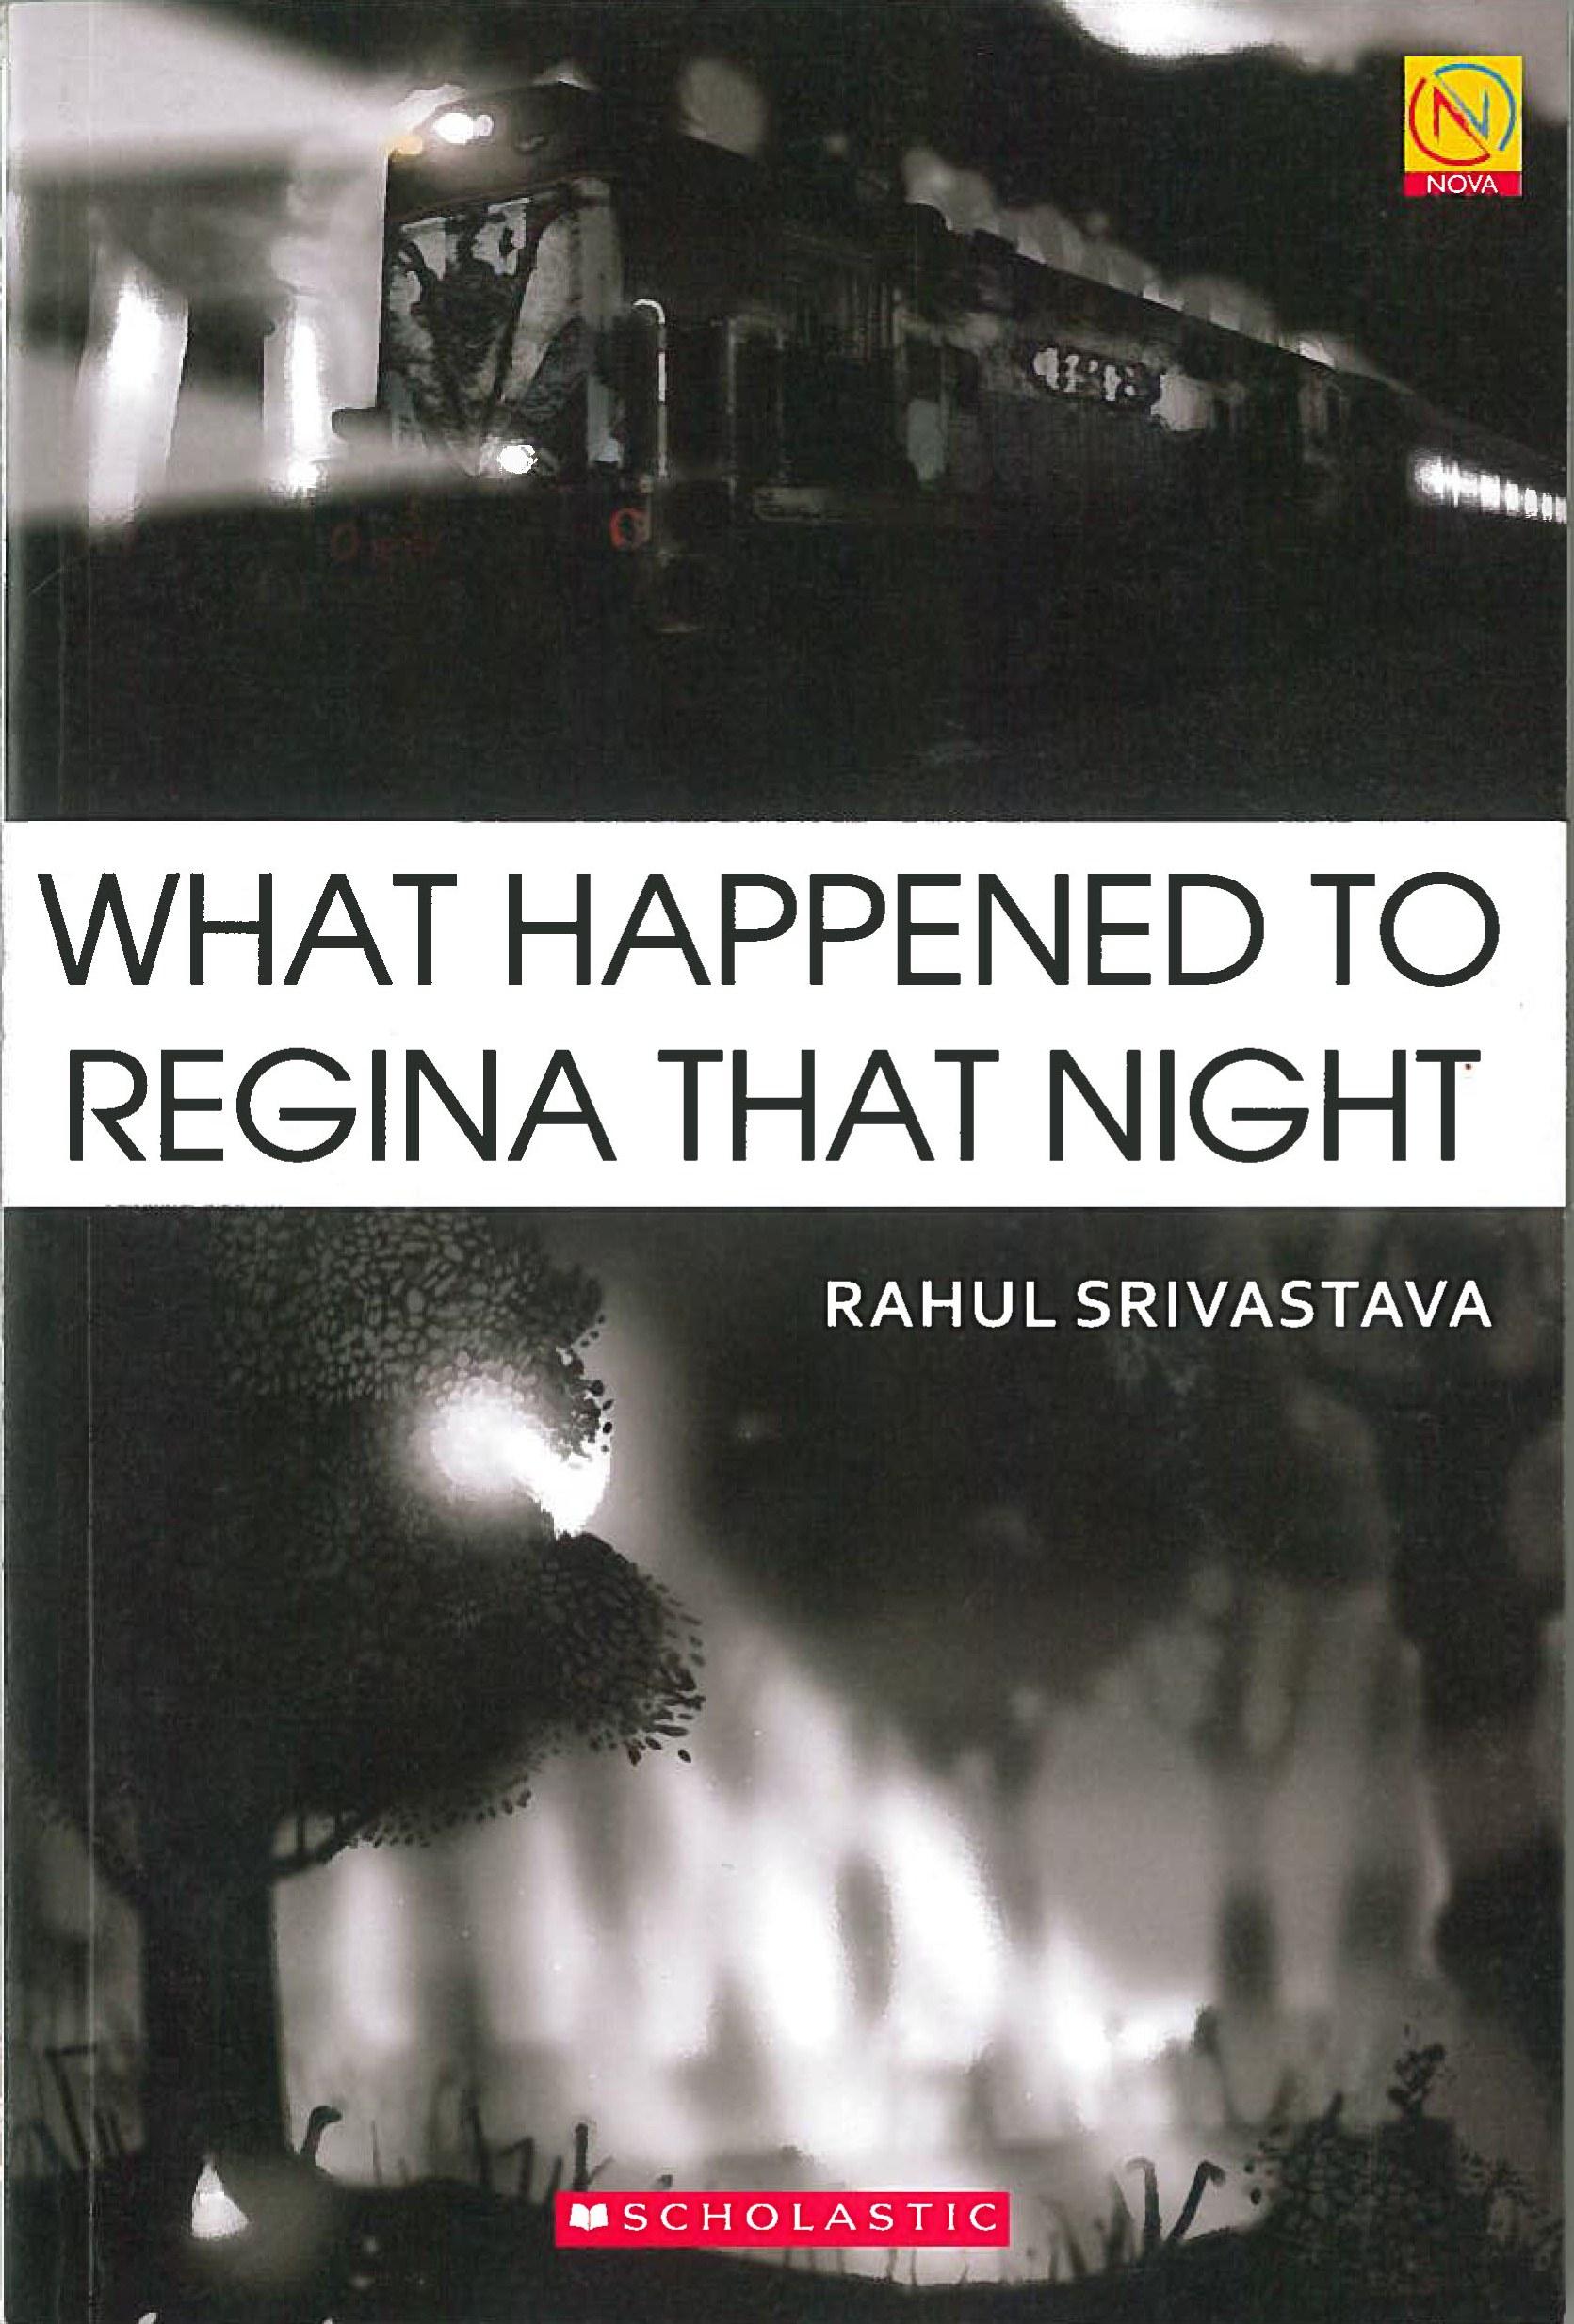 What Happened to Regina That Night